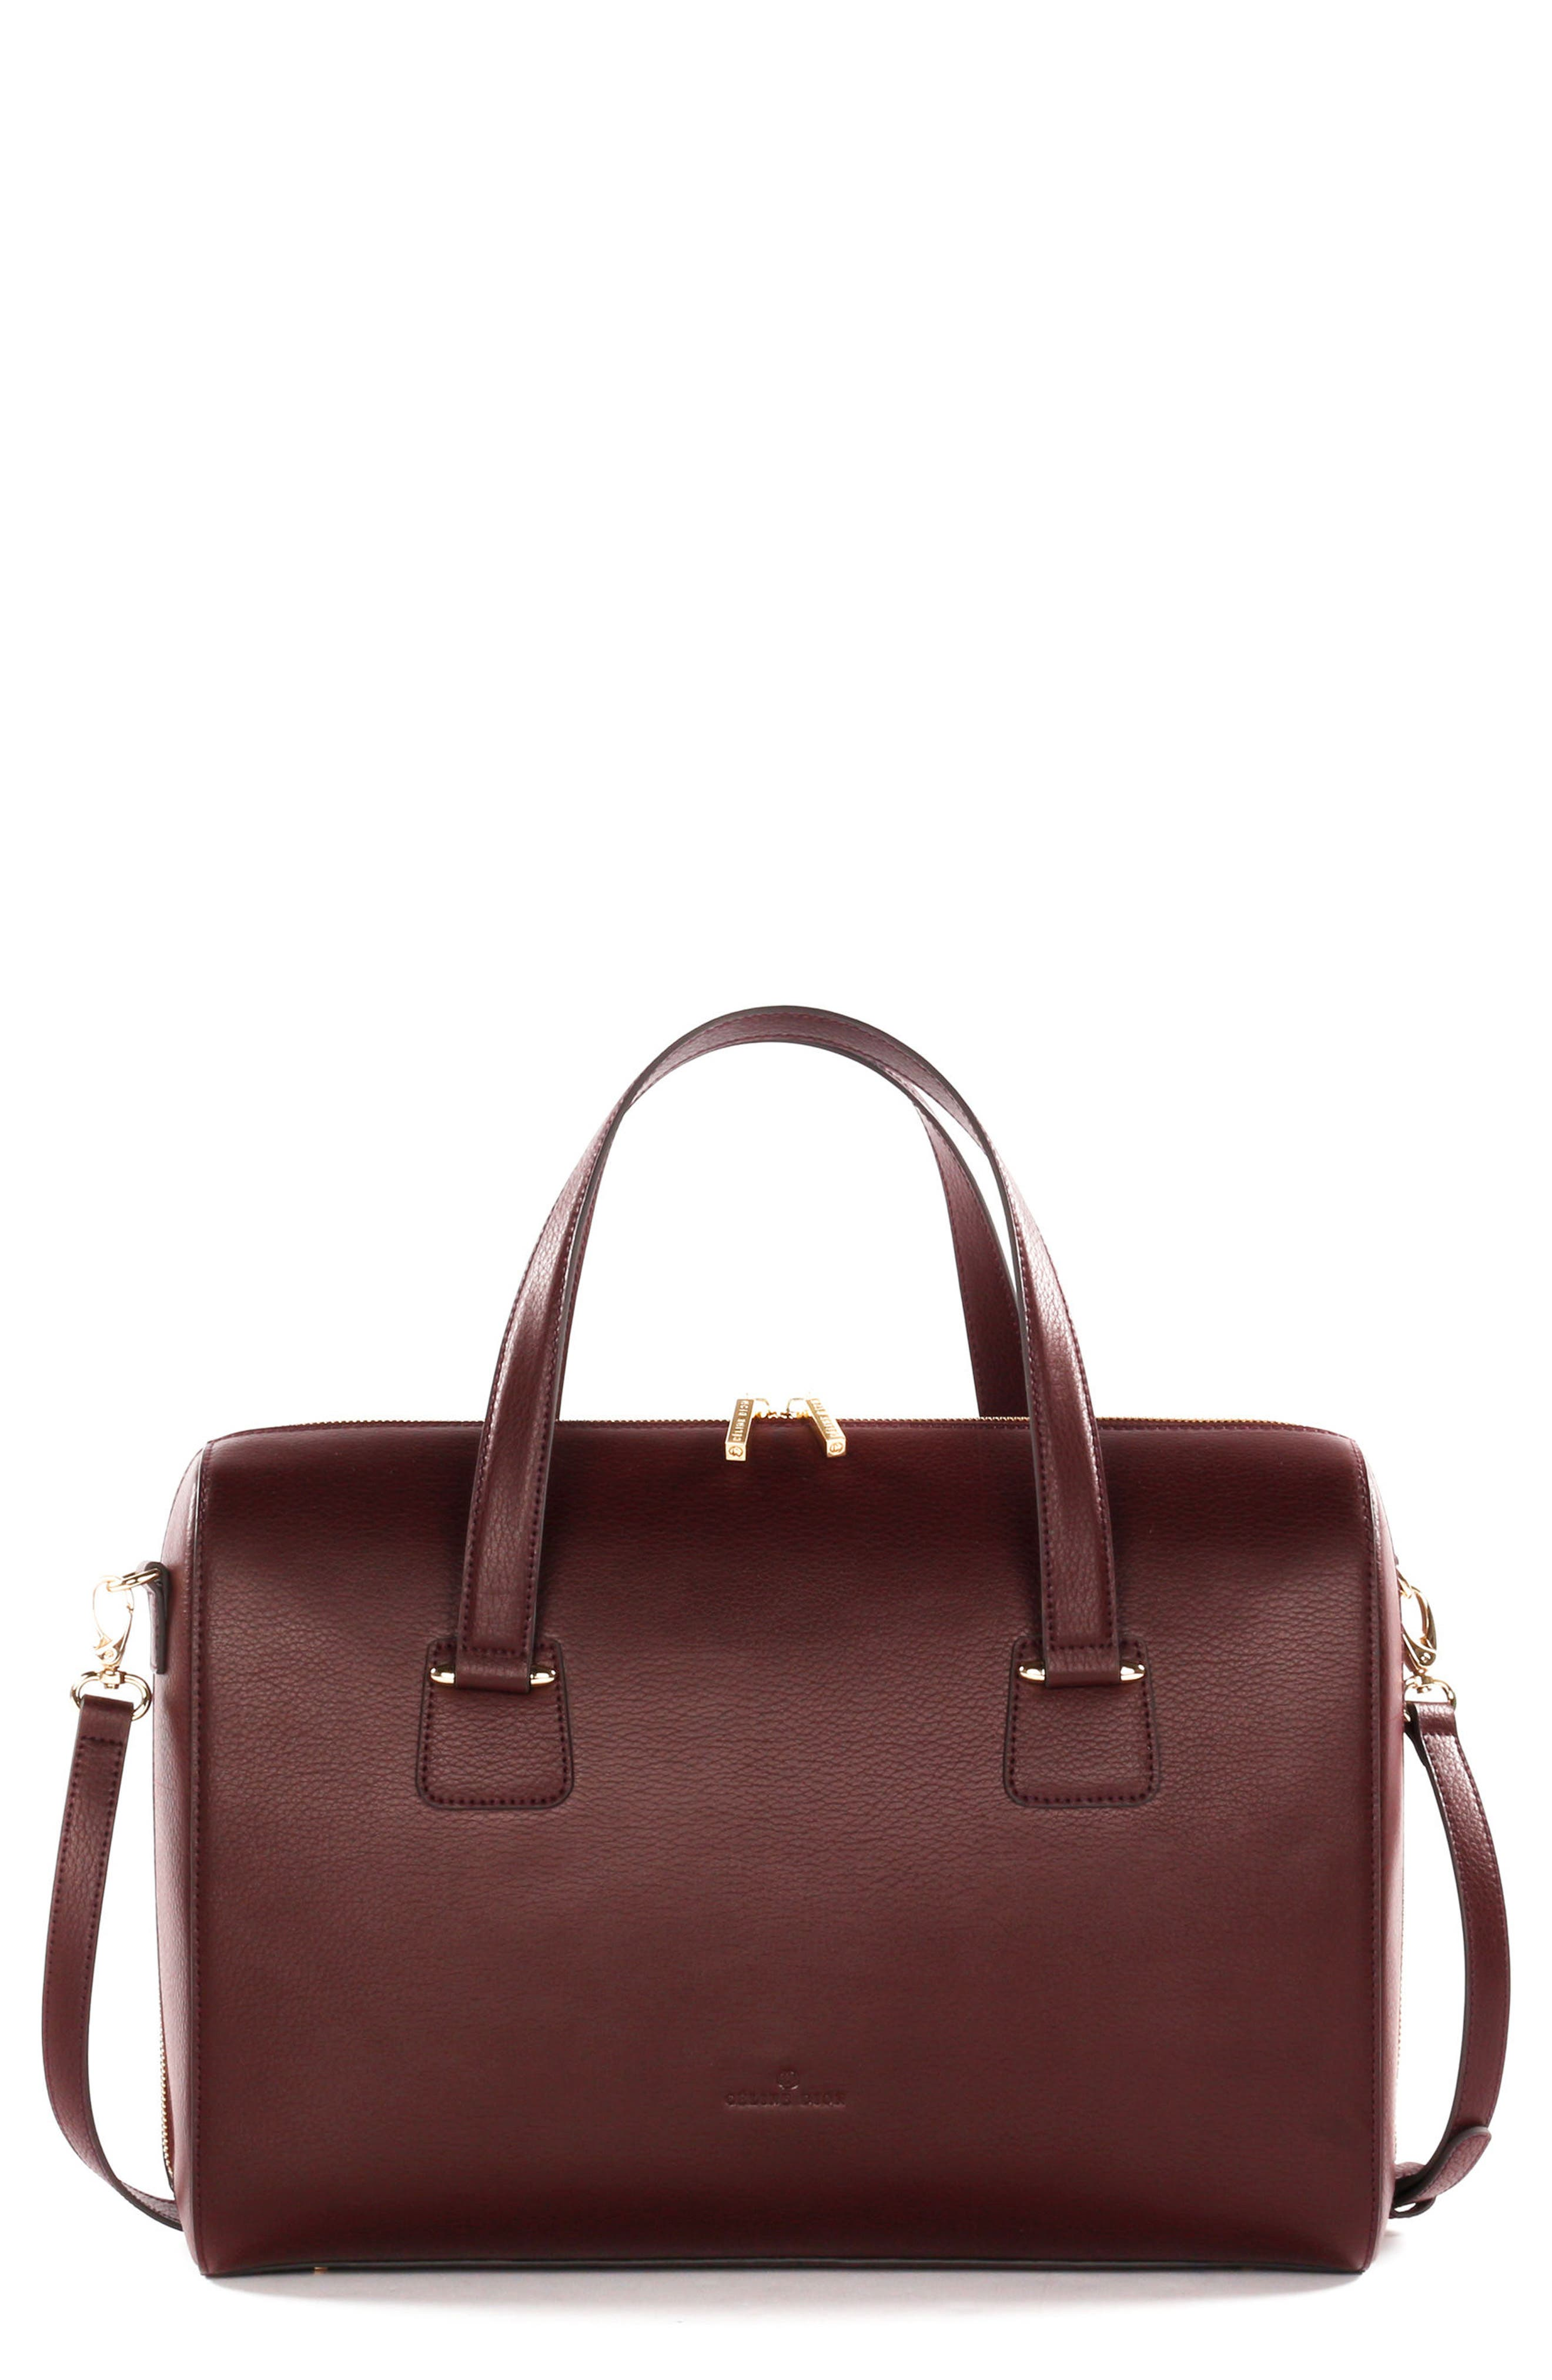 Main Image - Céline Dion Triad Leather Satchel